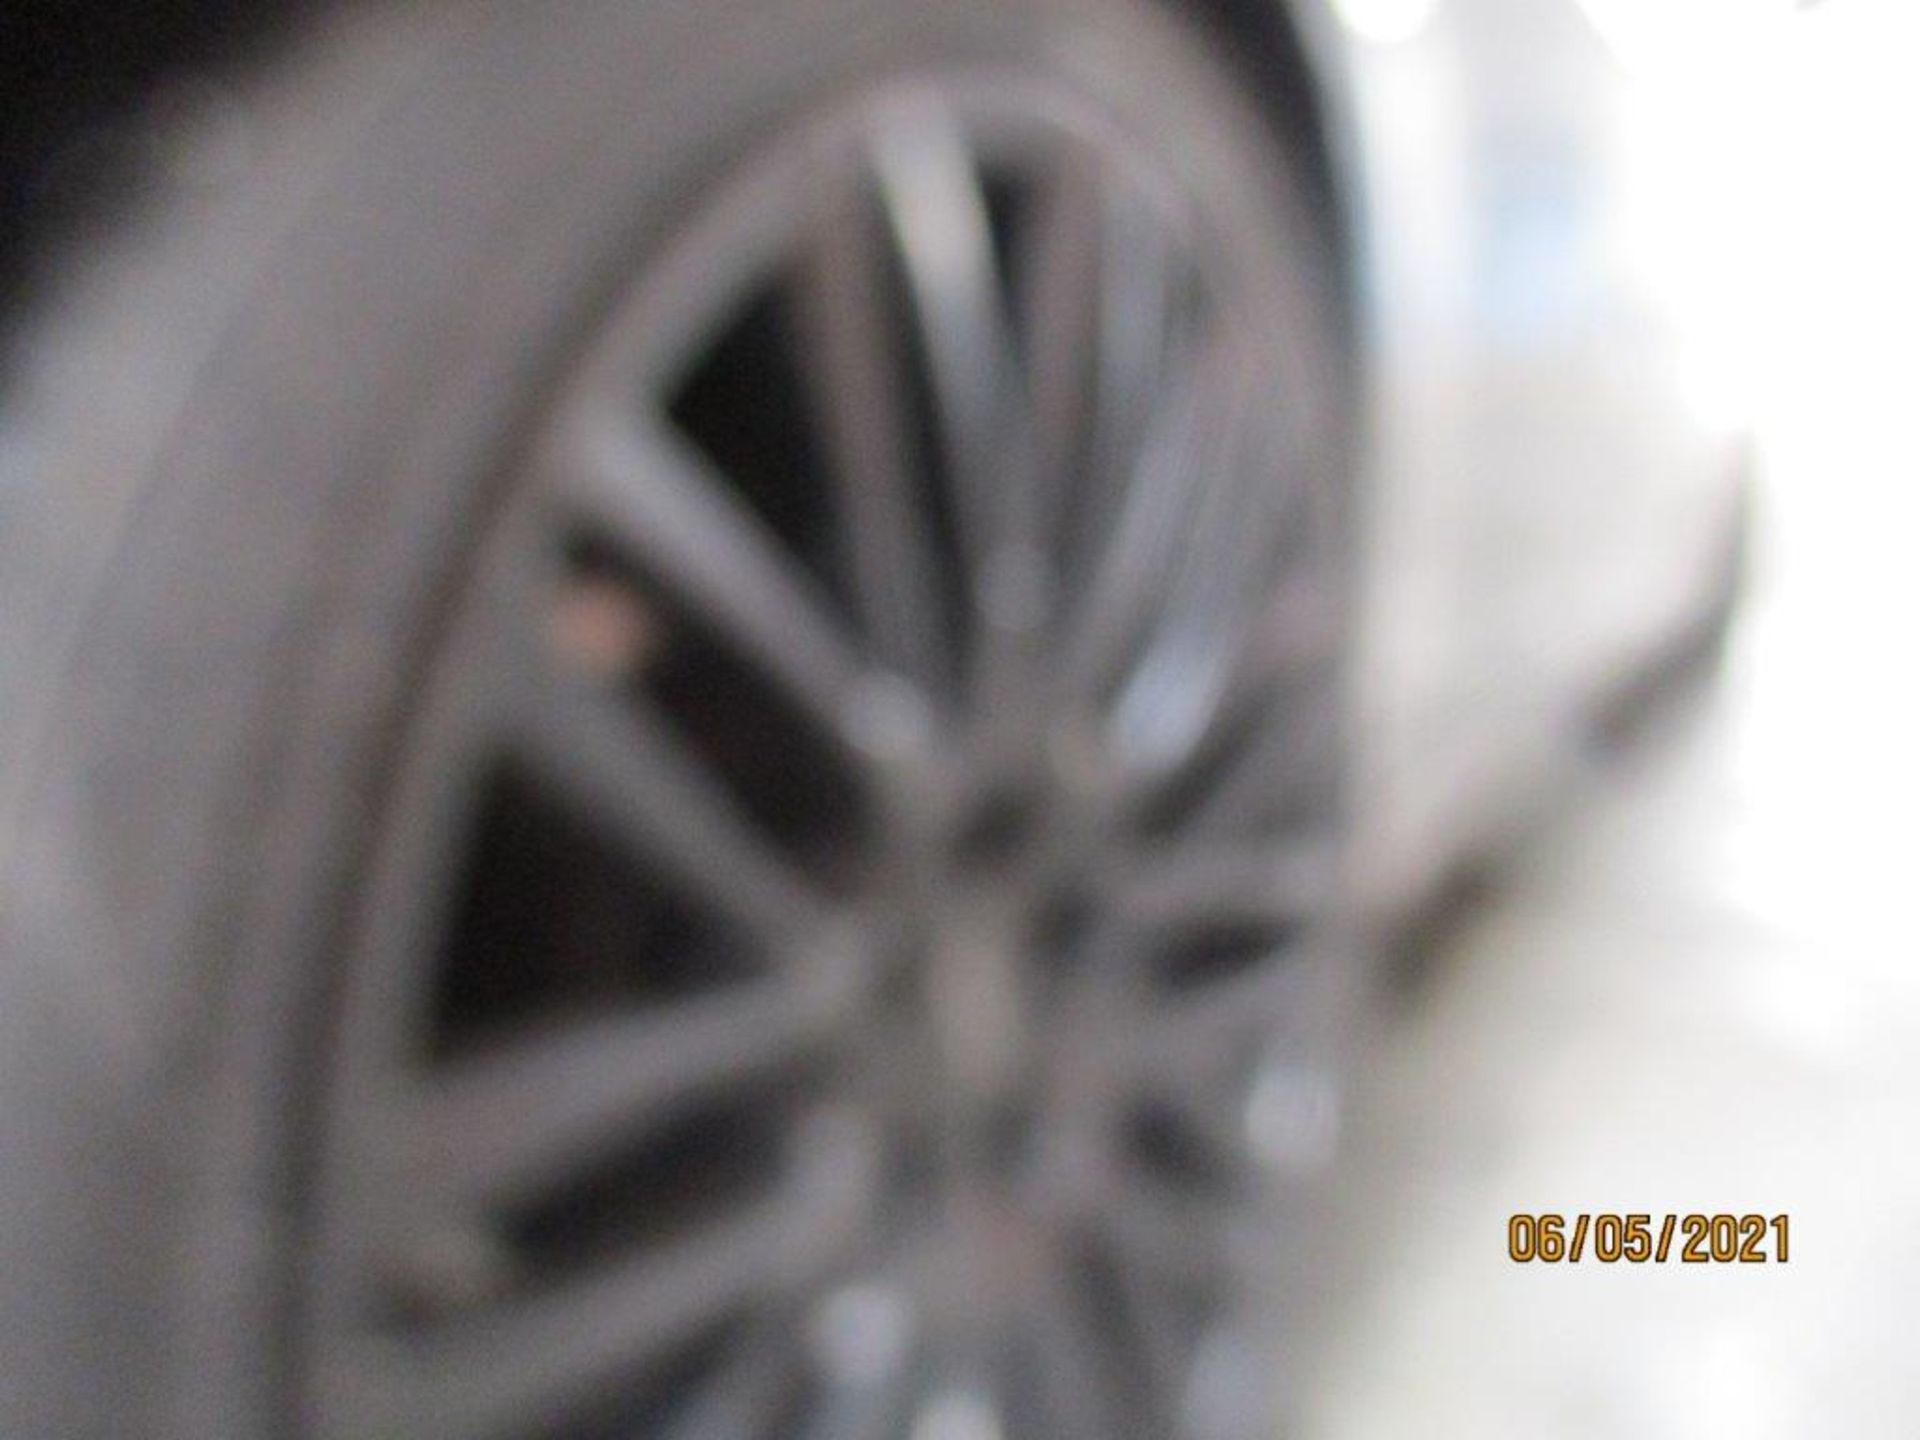 06 06 BMW 730 D Sport Auto - Image 15 of 23